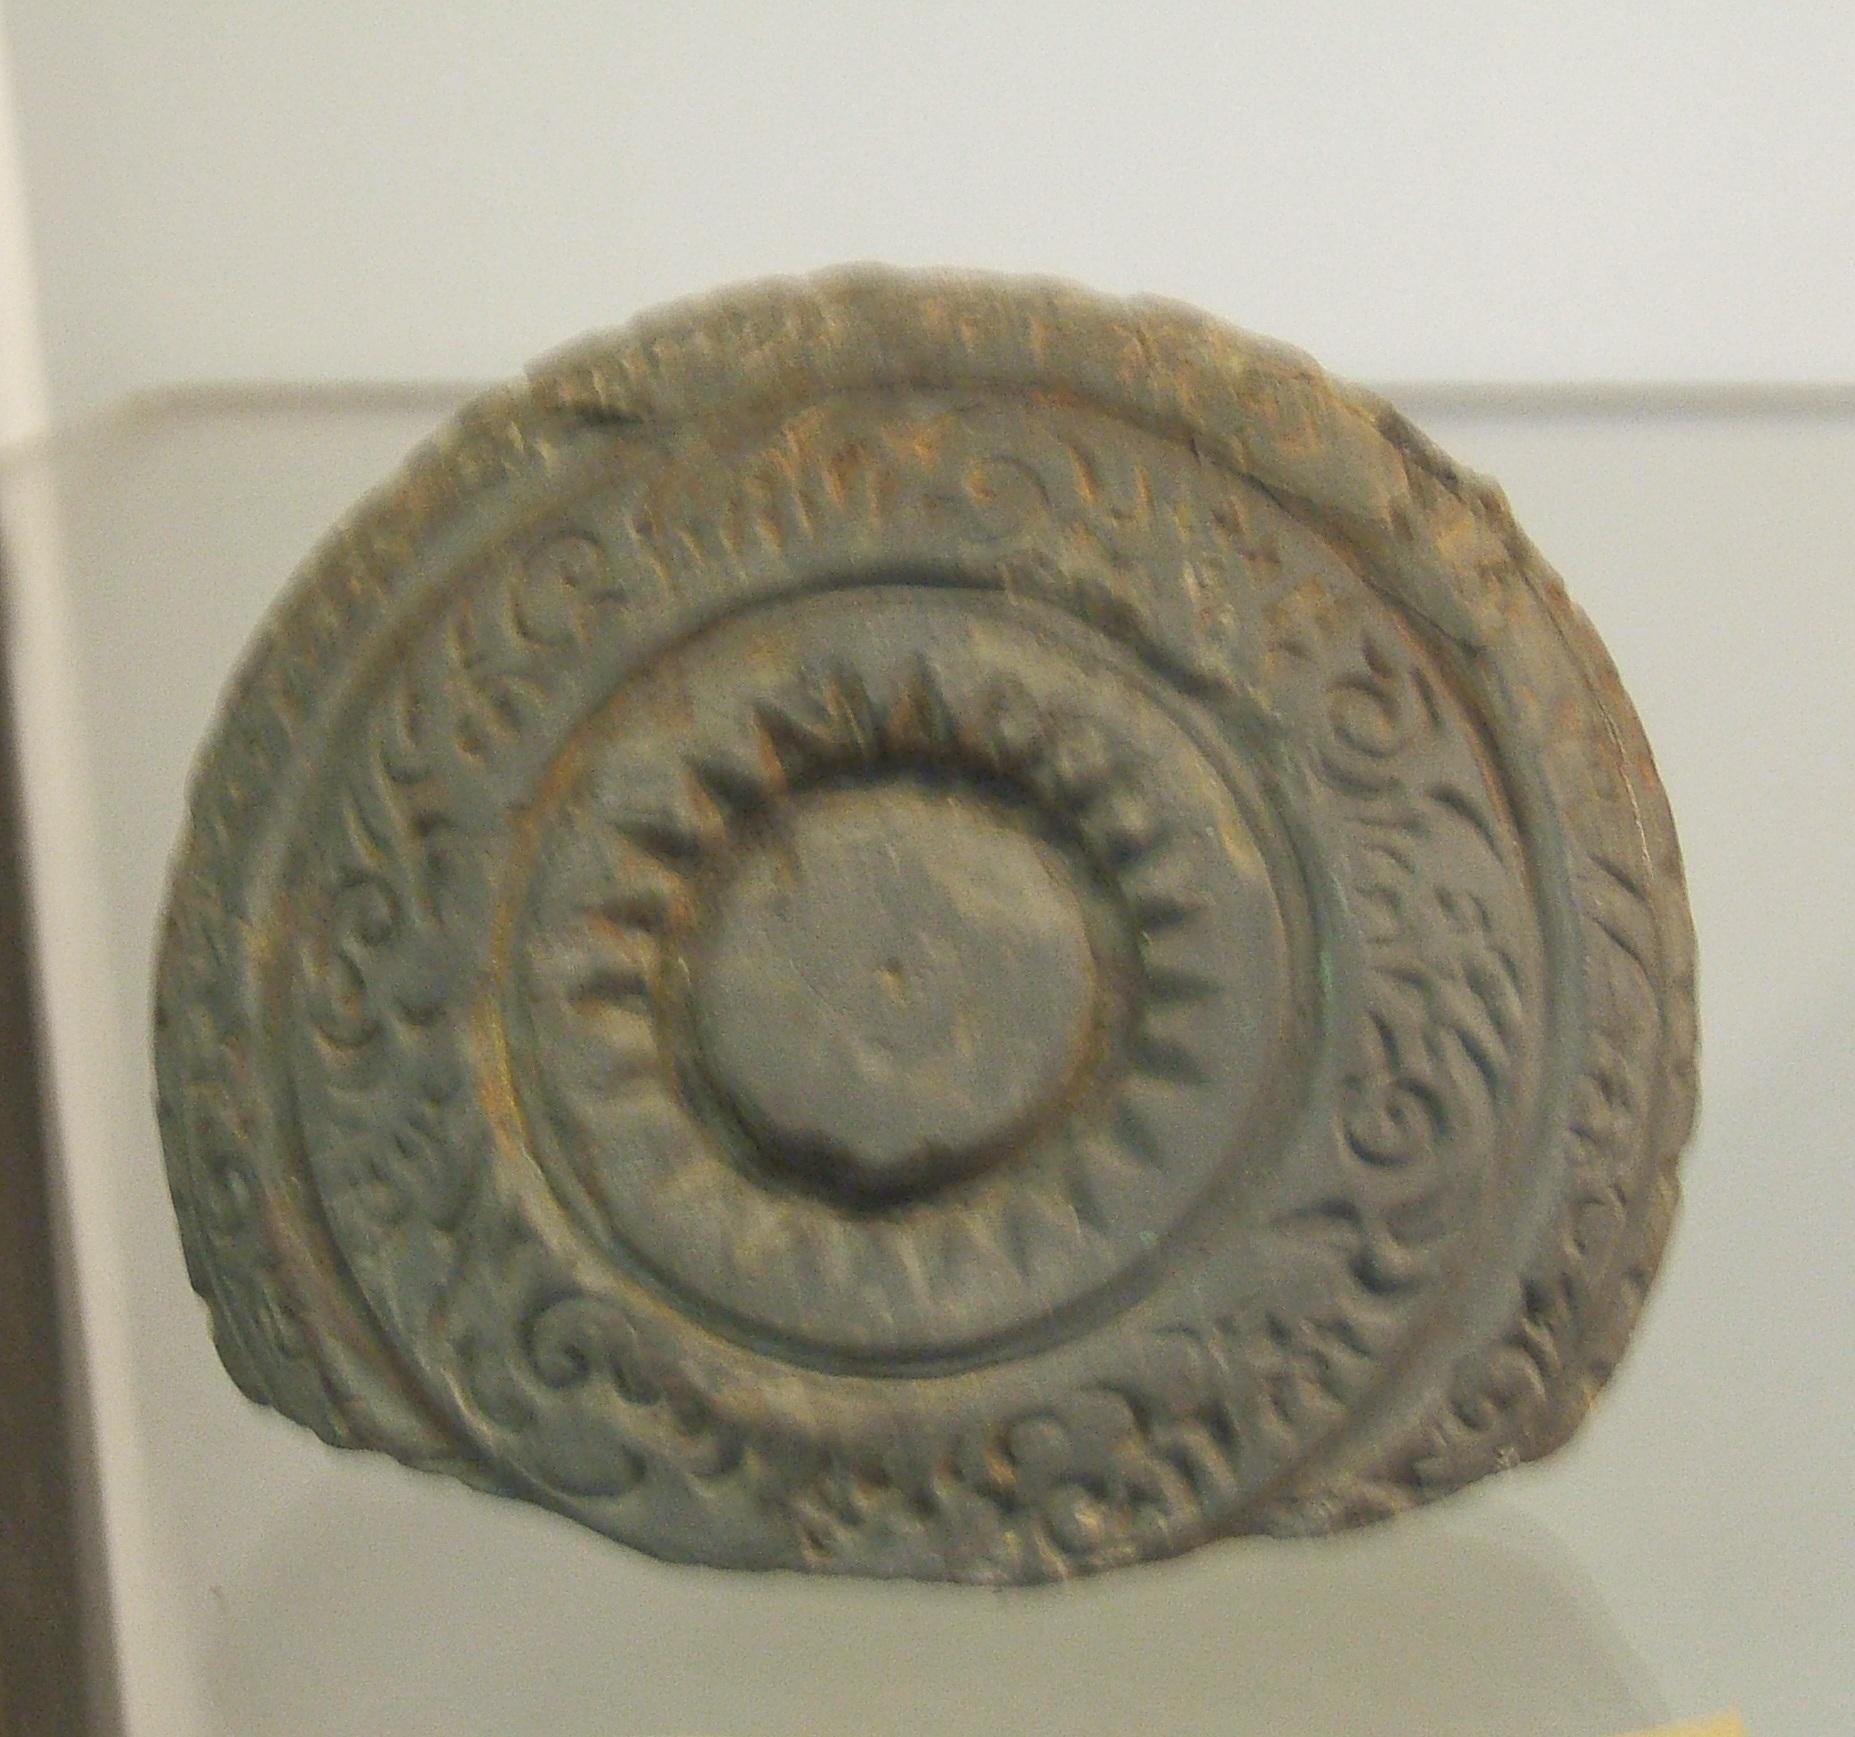 Stone seal photo